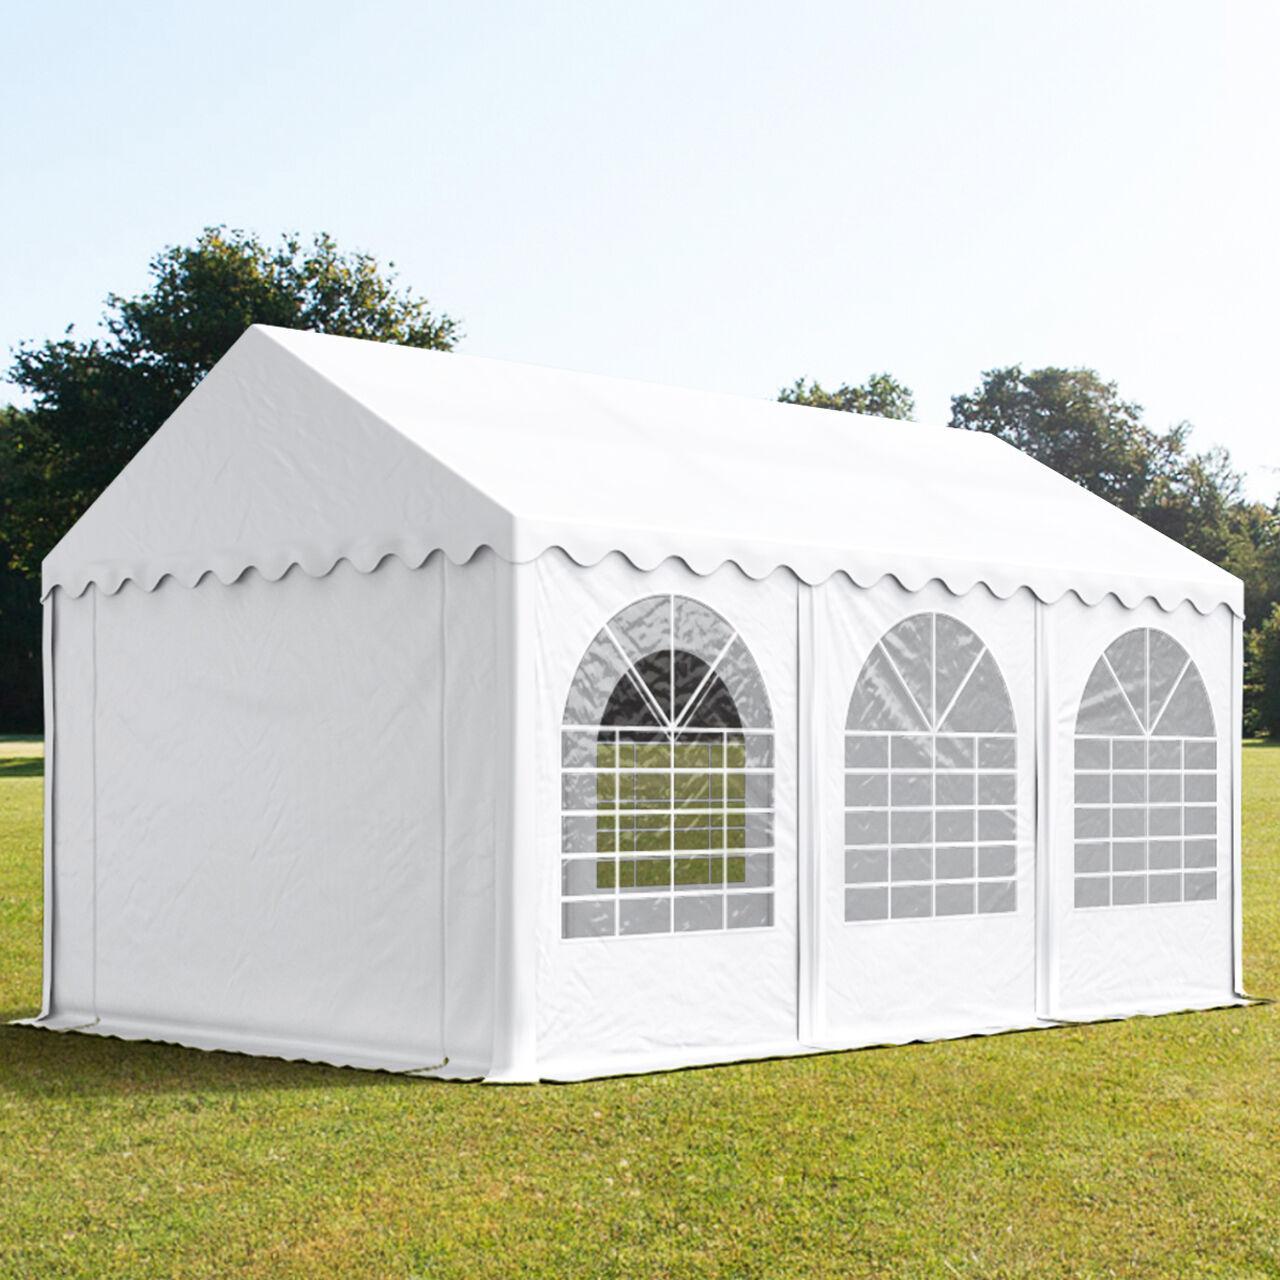 toolport tendone per feste 3x6m pvc 550 g/m² bianco sì